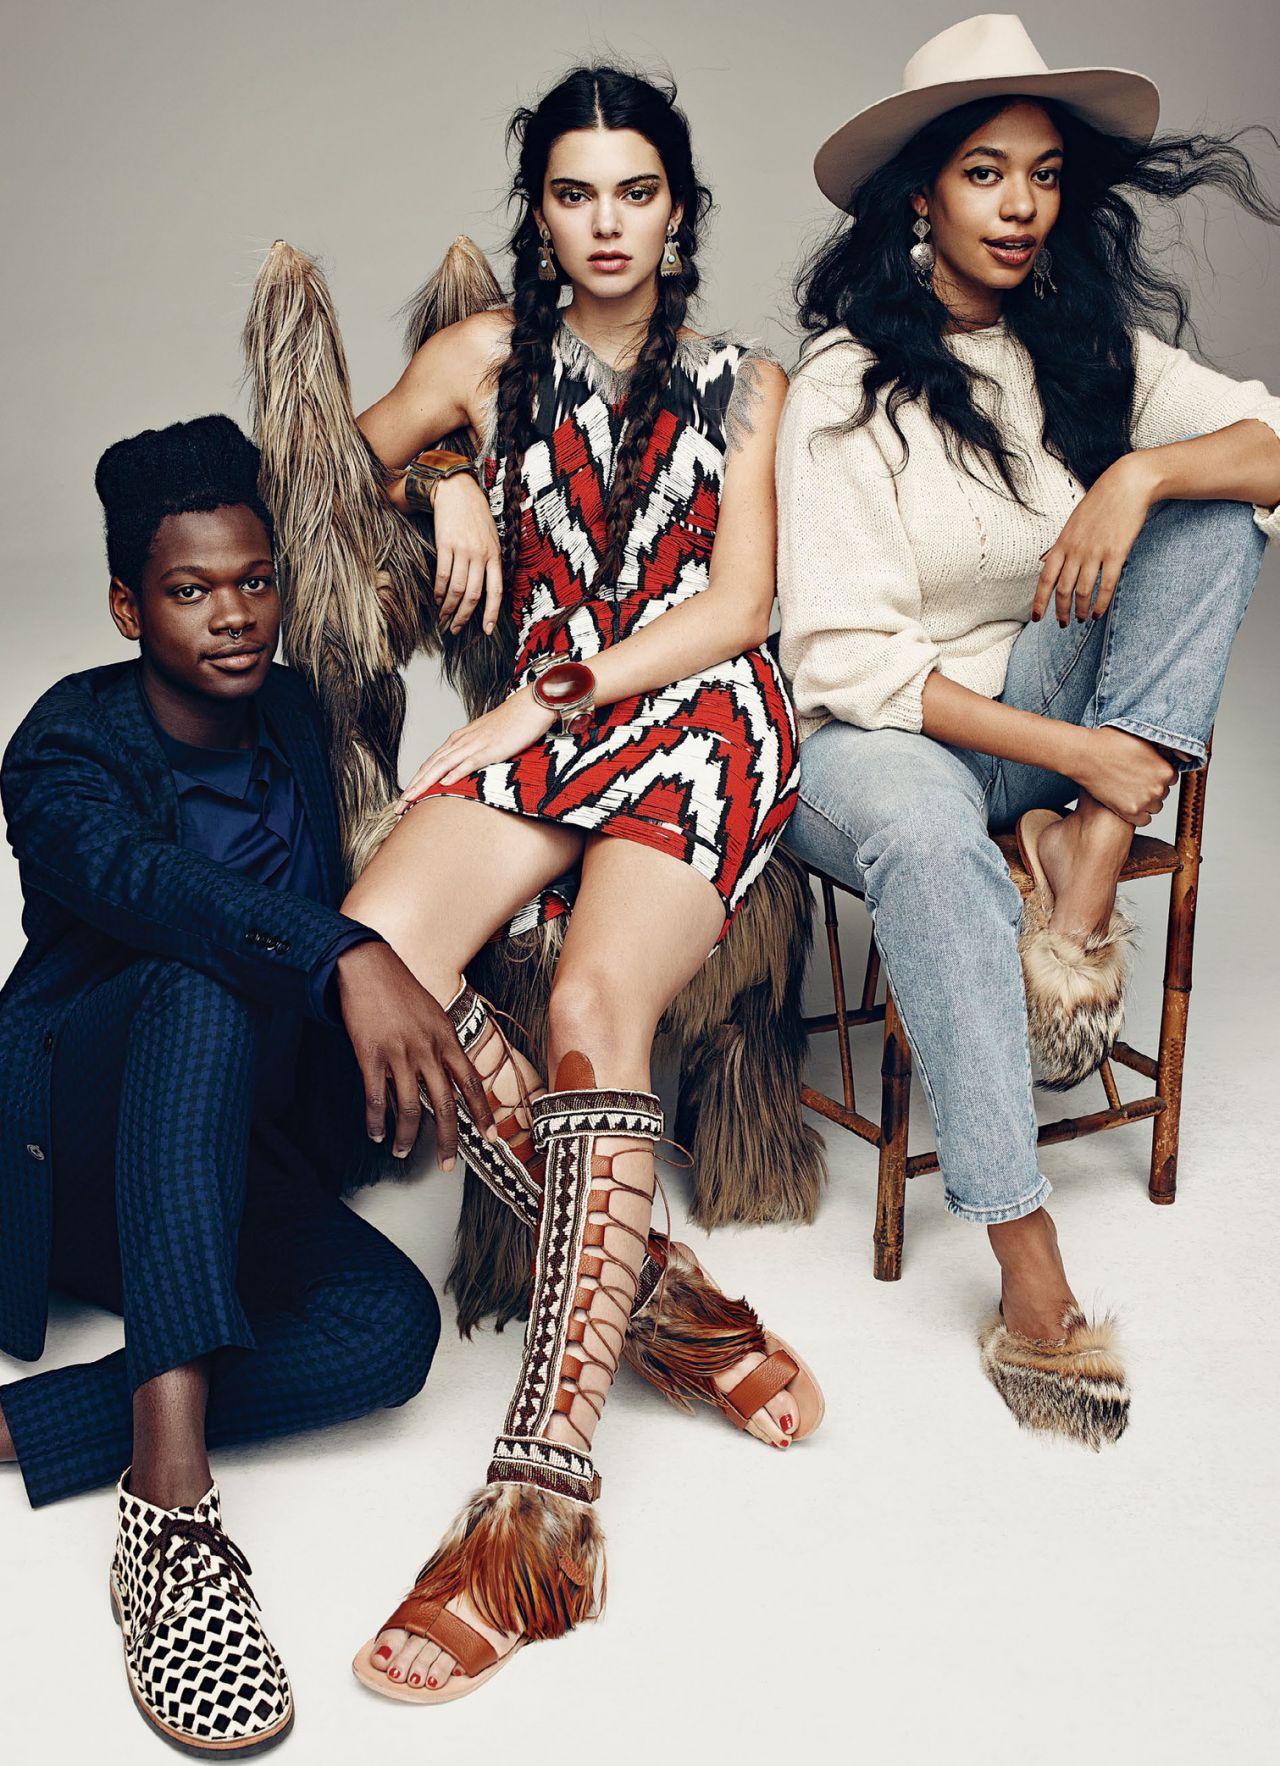 Kendall Jenner - Photoshoot for Vogue Magazine November 2015